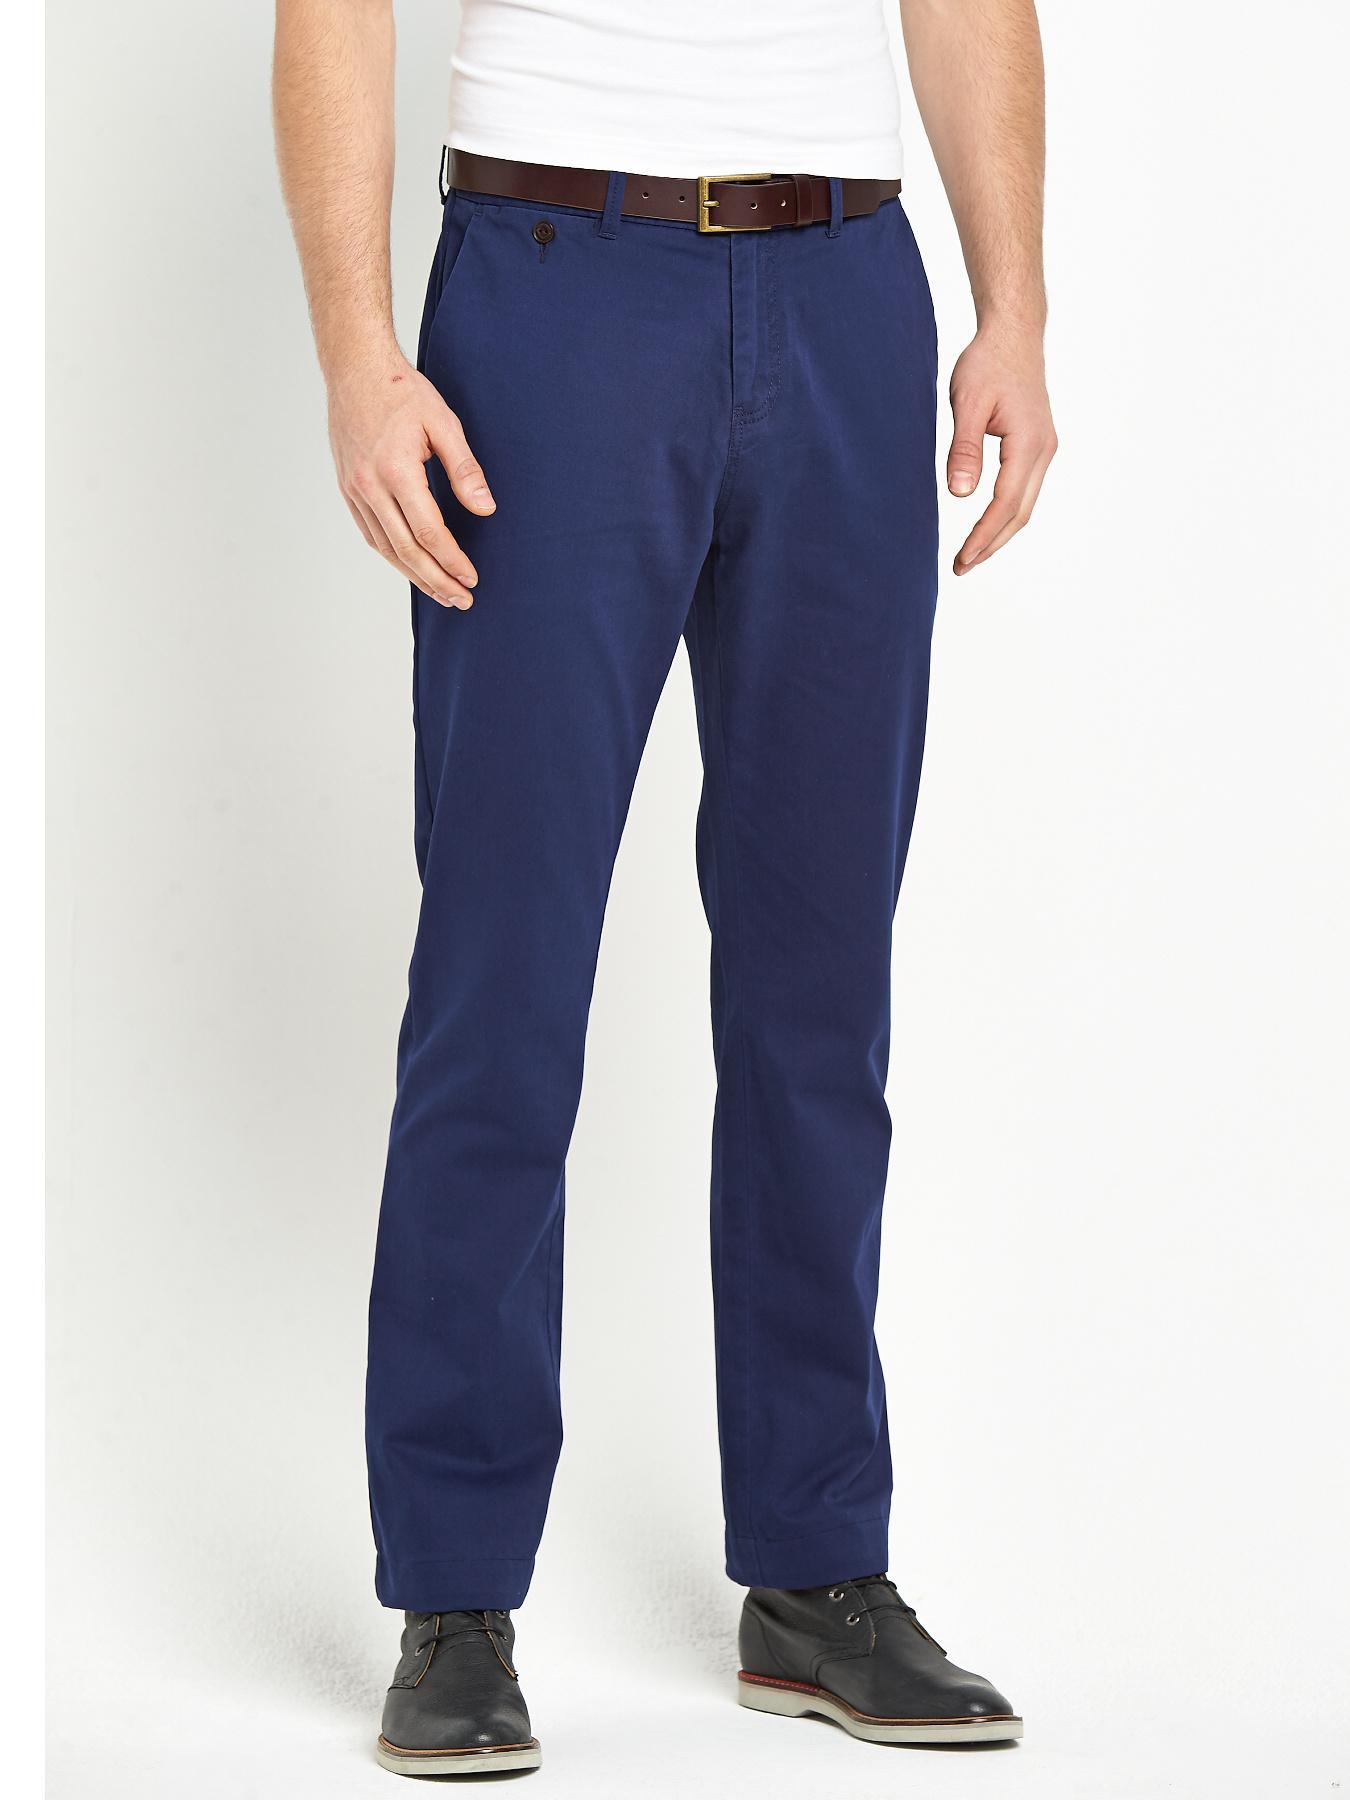 Goodsouls Mens Premium Occasionwear Chinos - Navy, Navy